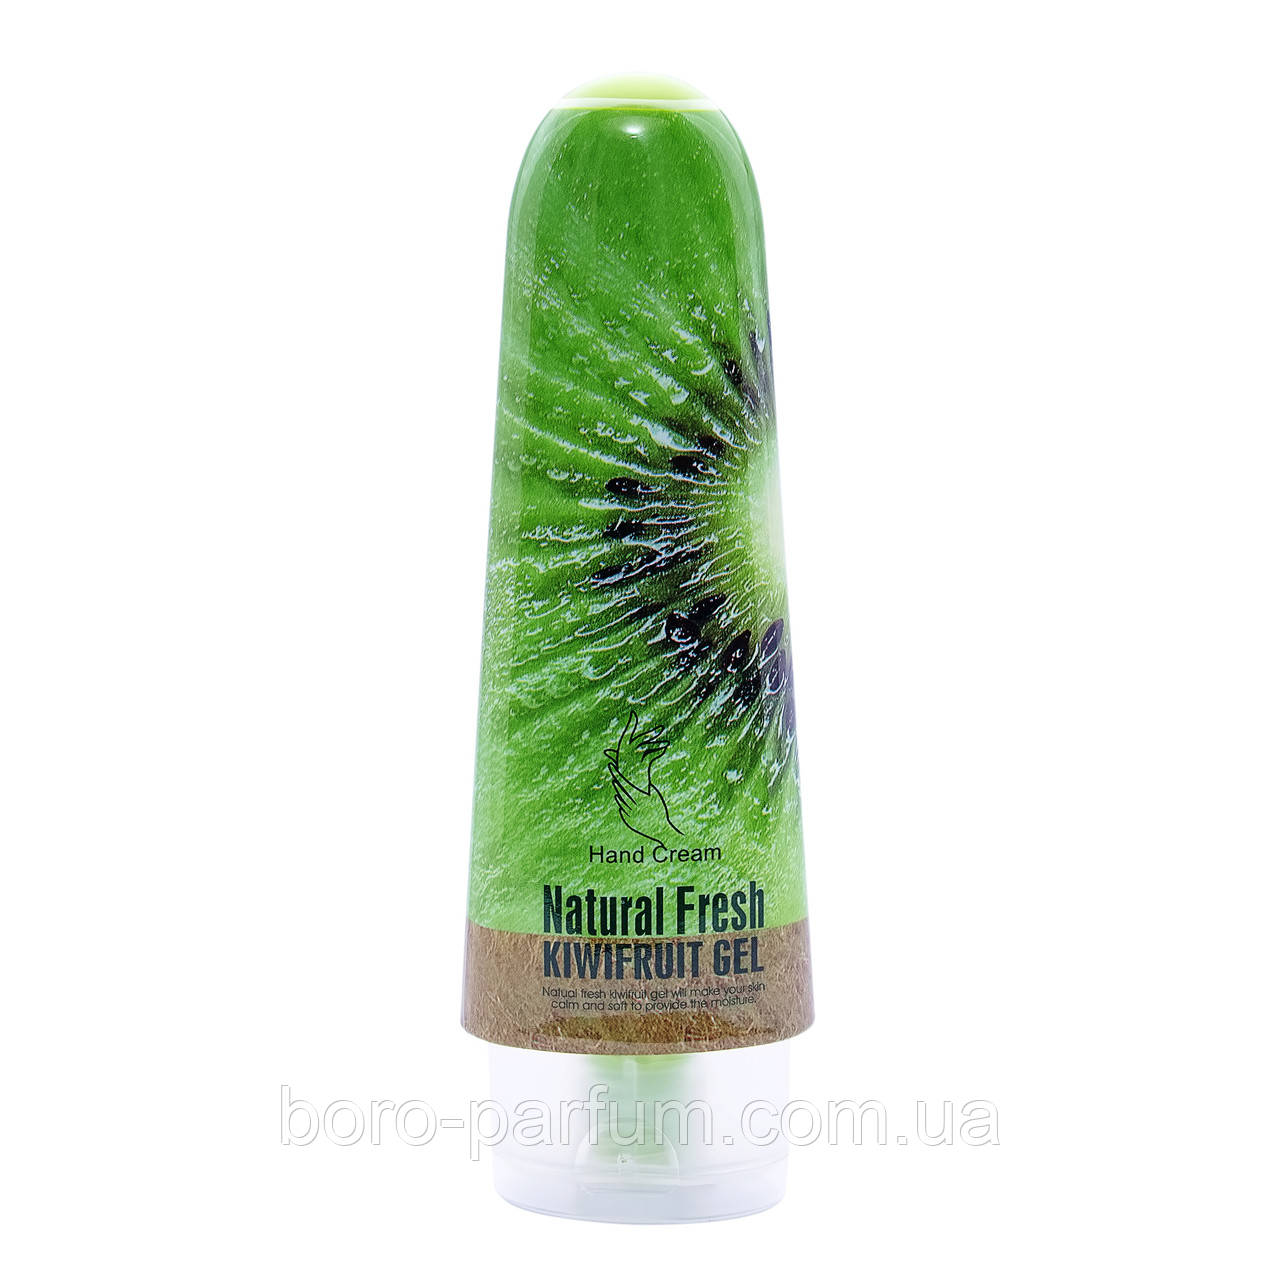 Крем для рук фруктовый  NATURAL FRESH Kiwifruit